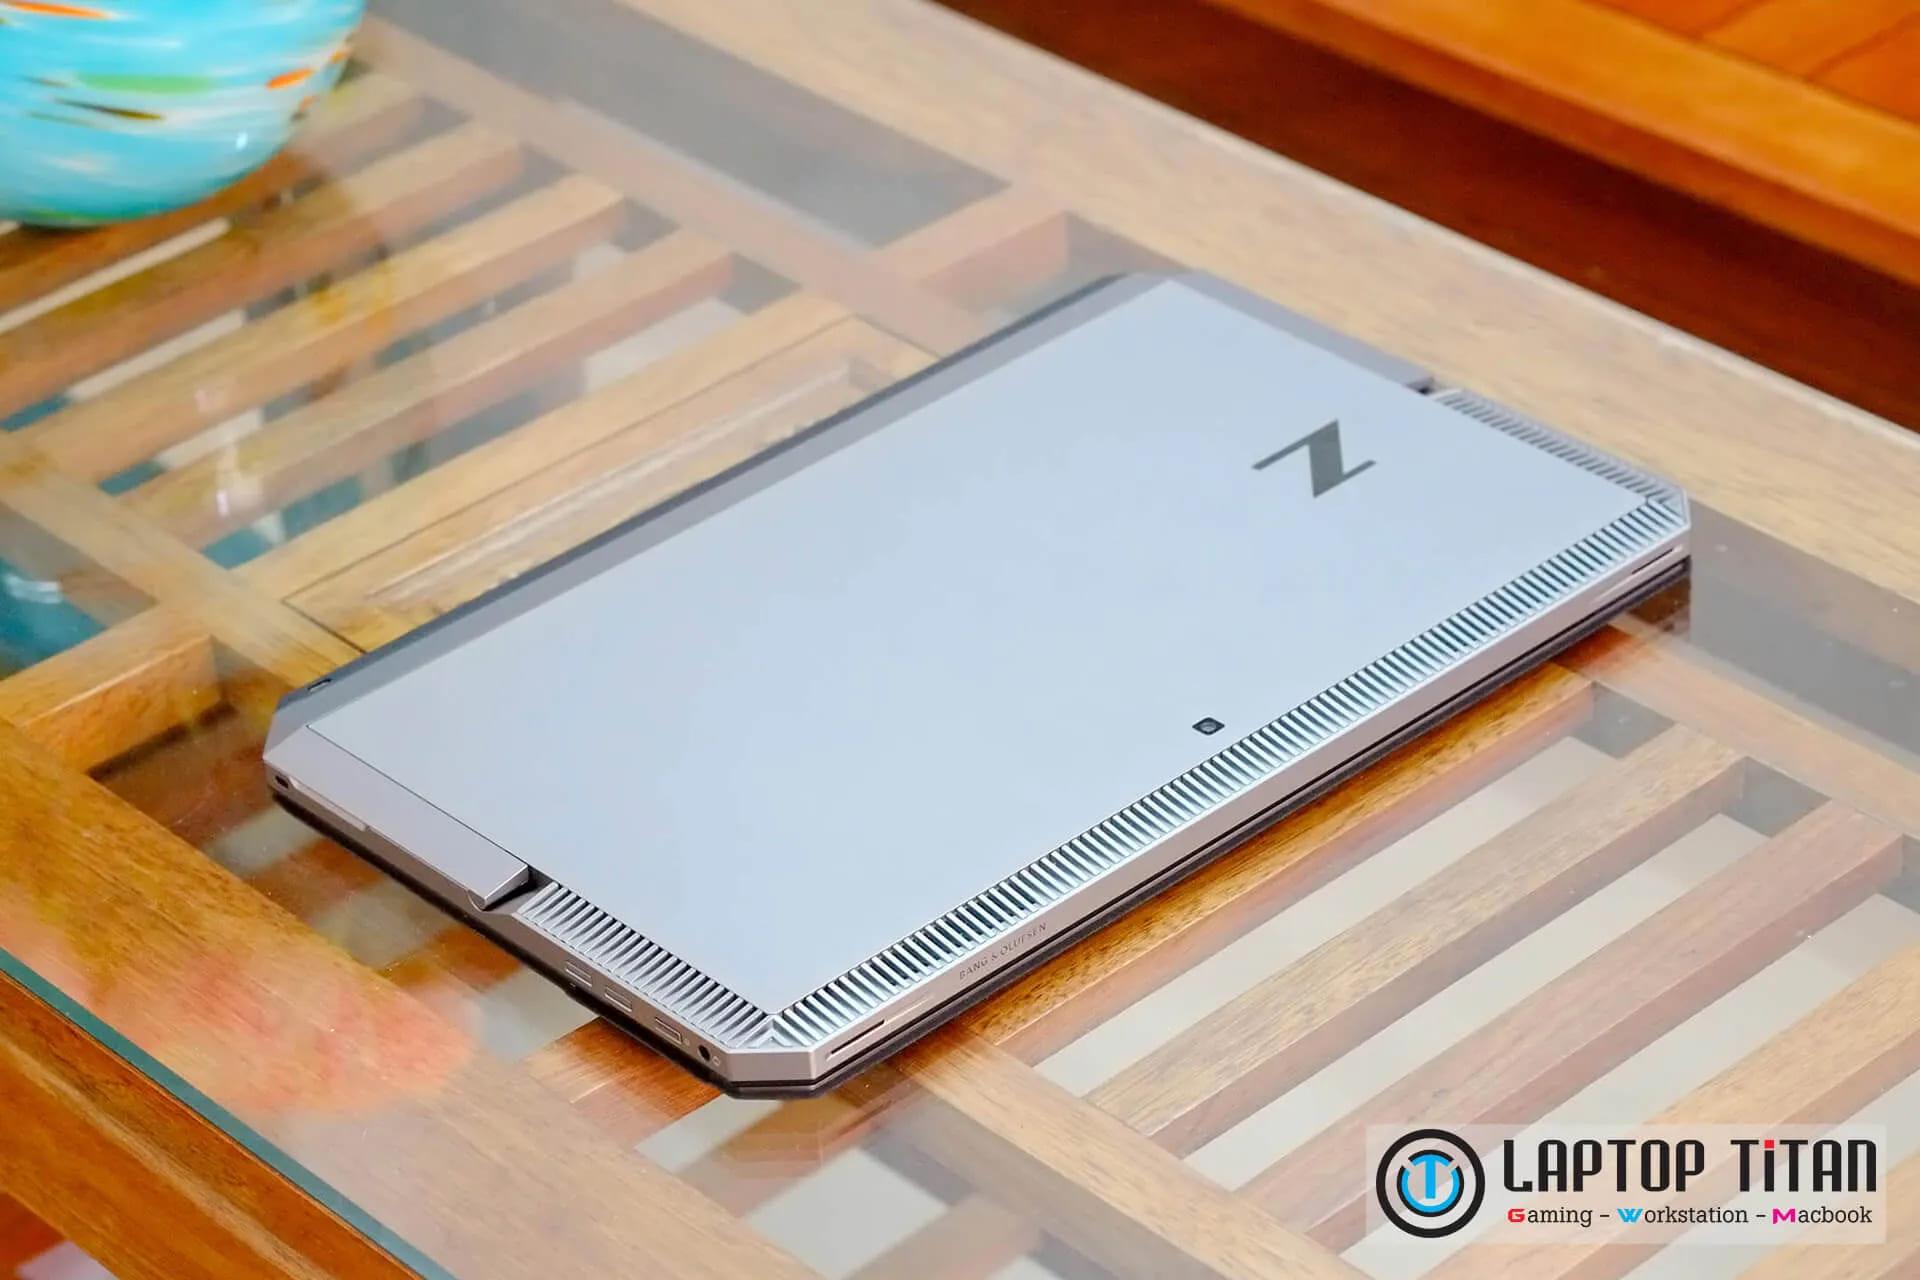 Hp Zbook X2 G4 Laptoptitan 01